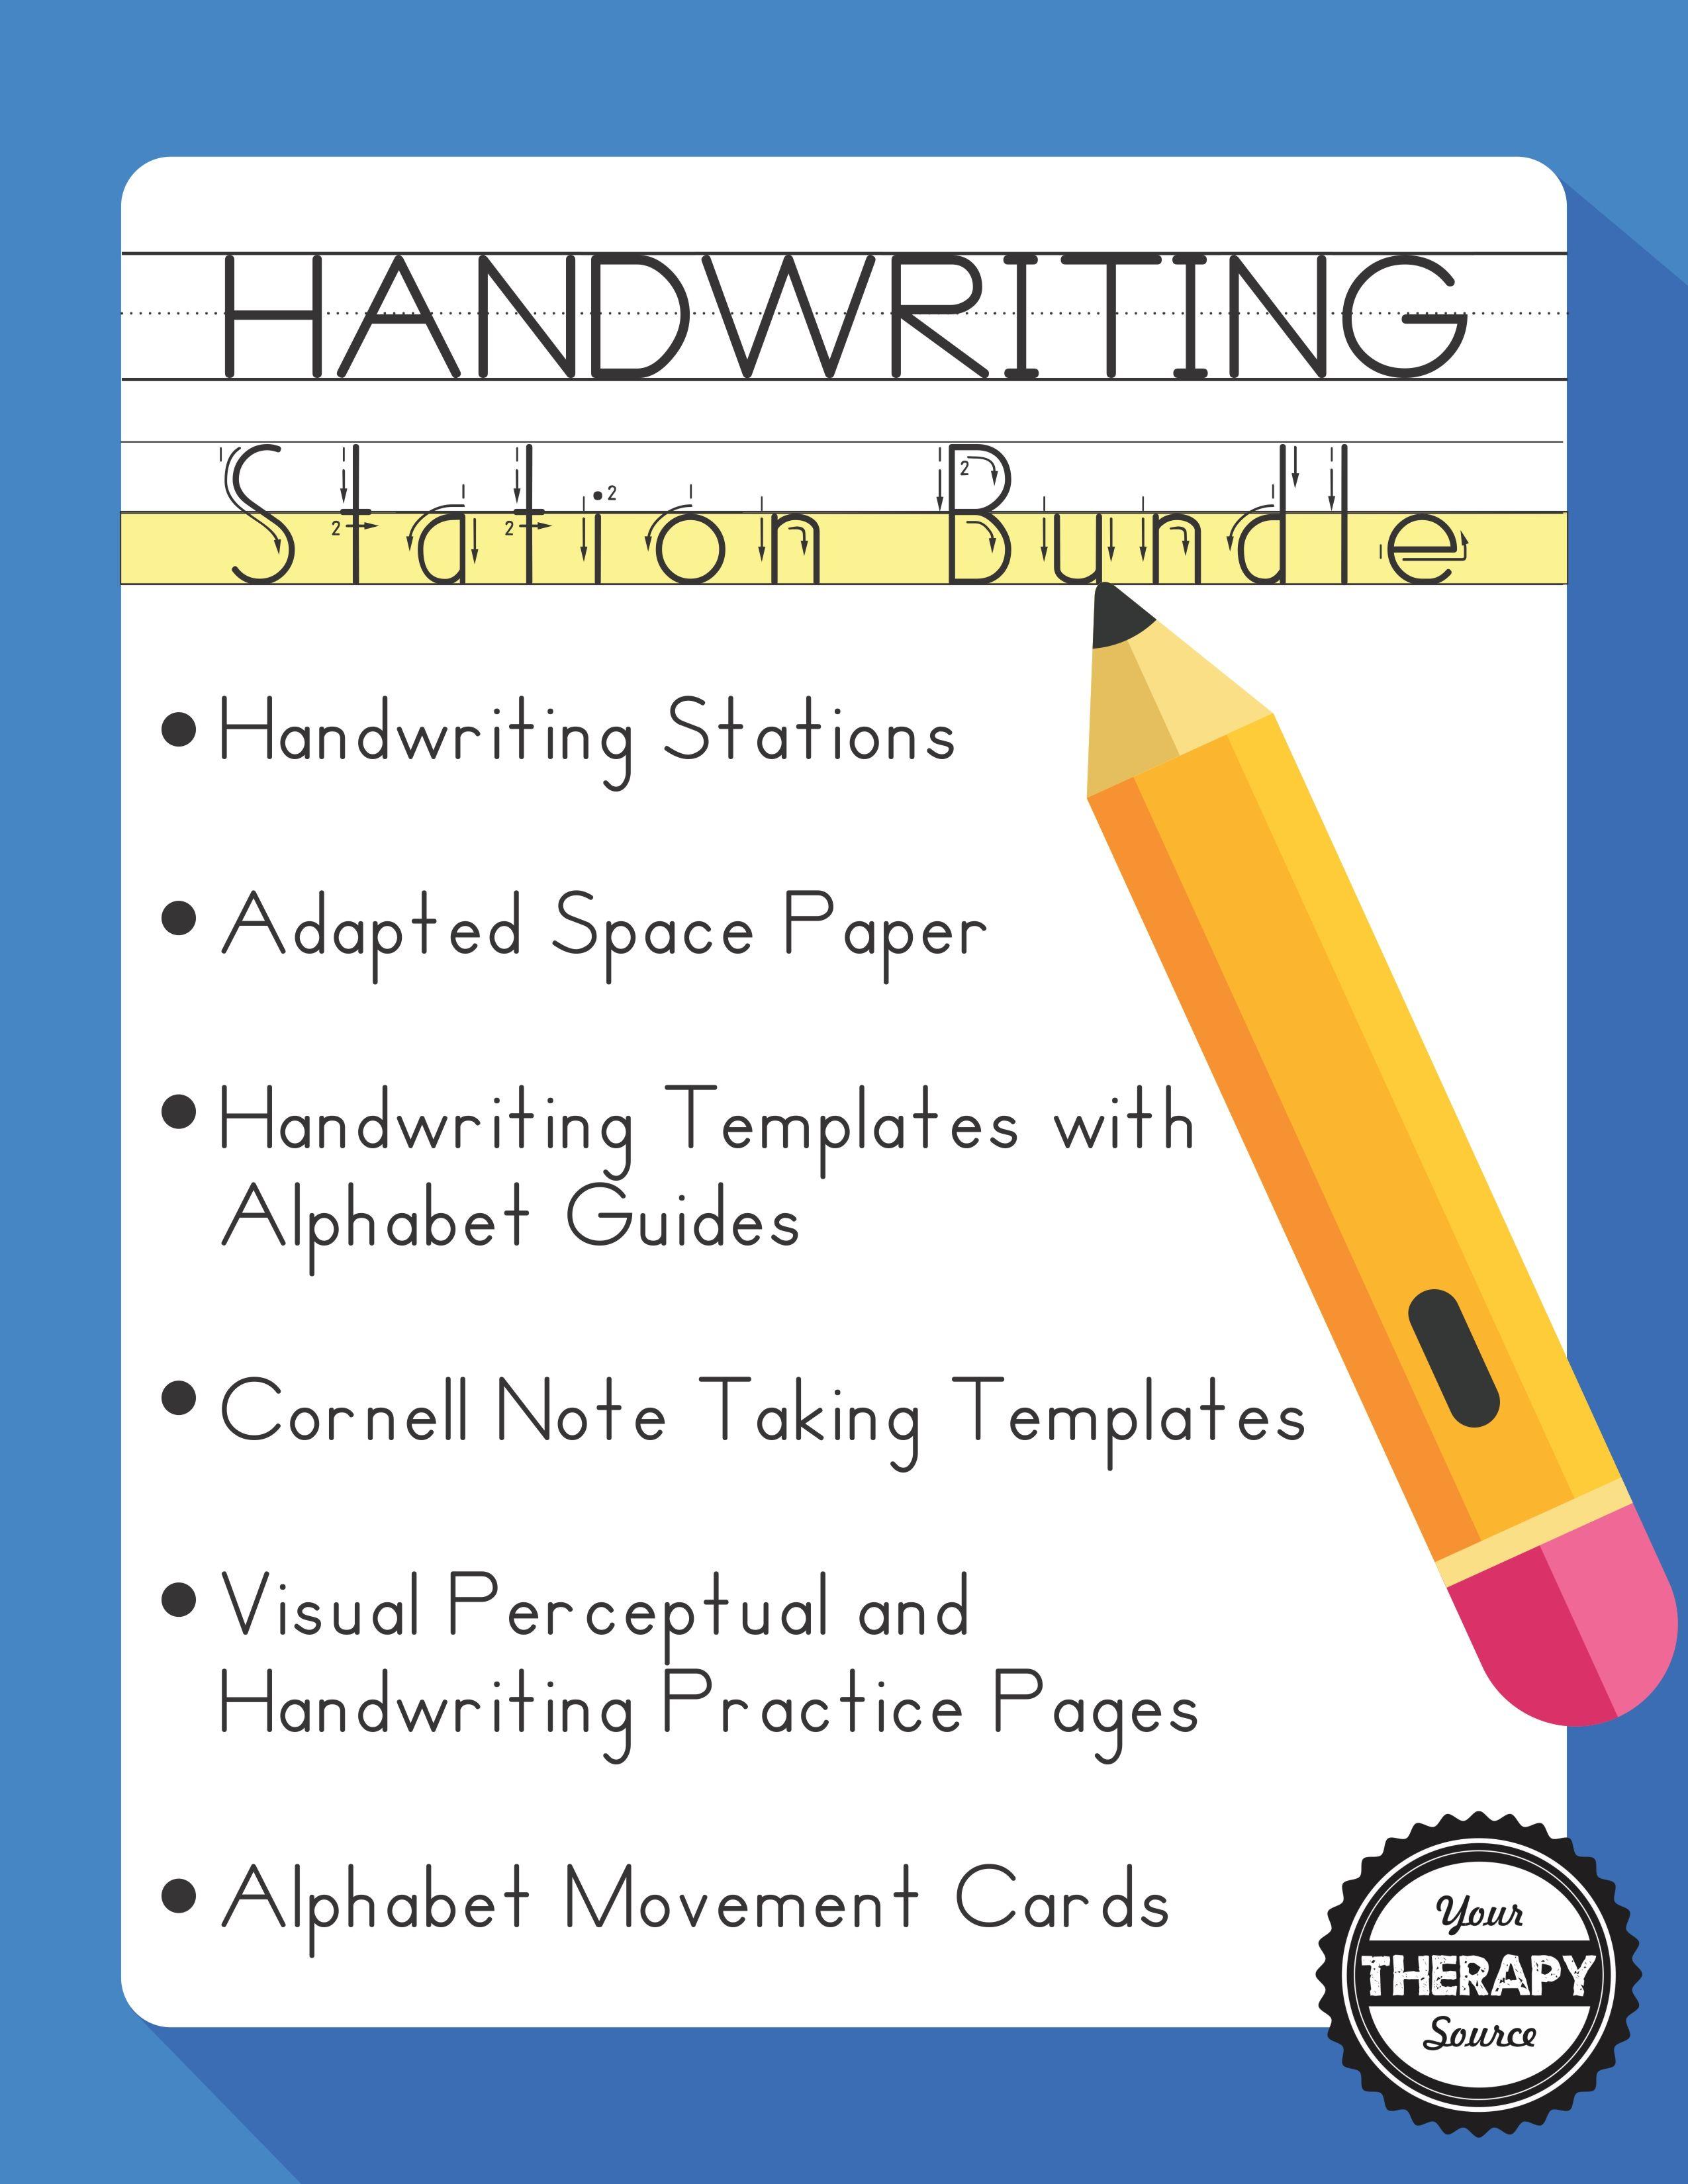 Handwriting Station Bundle